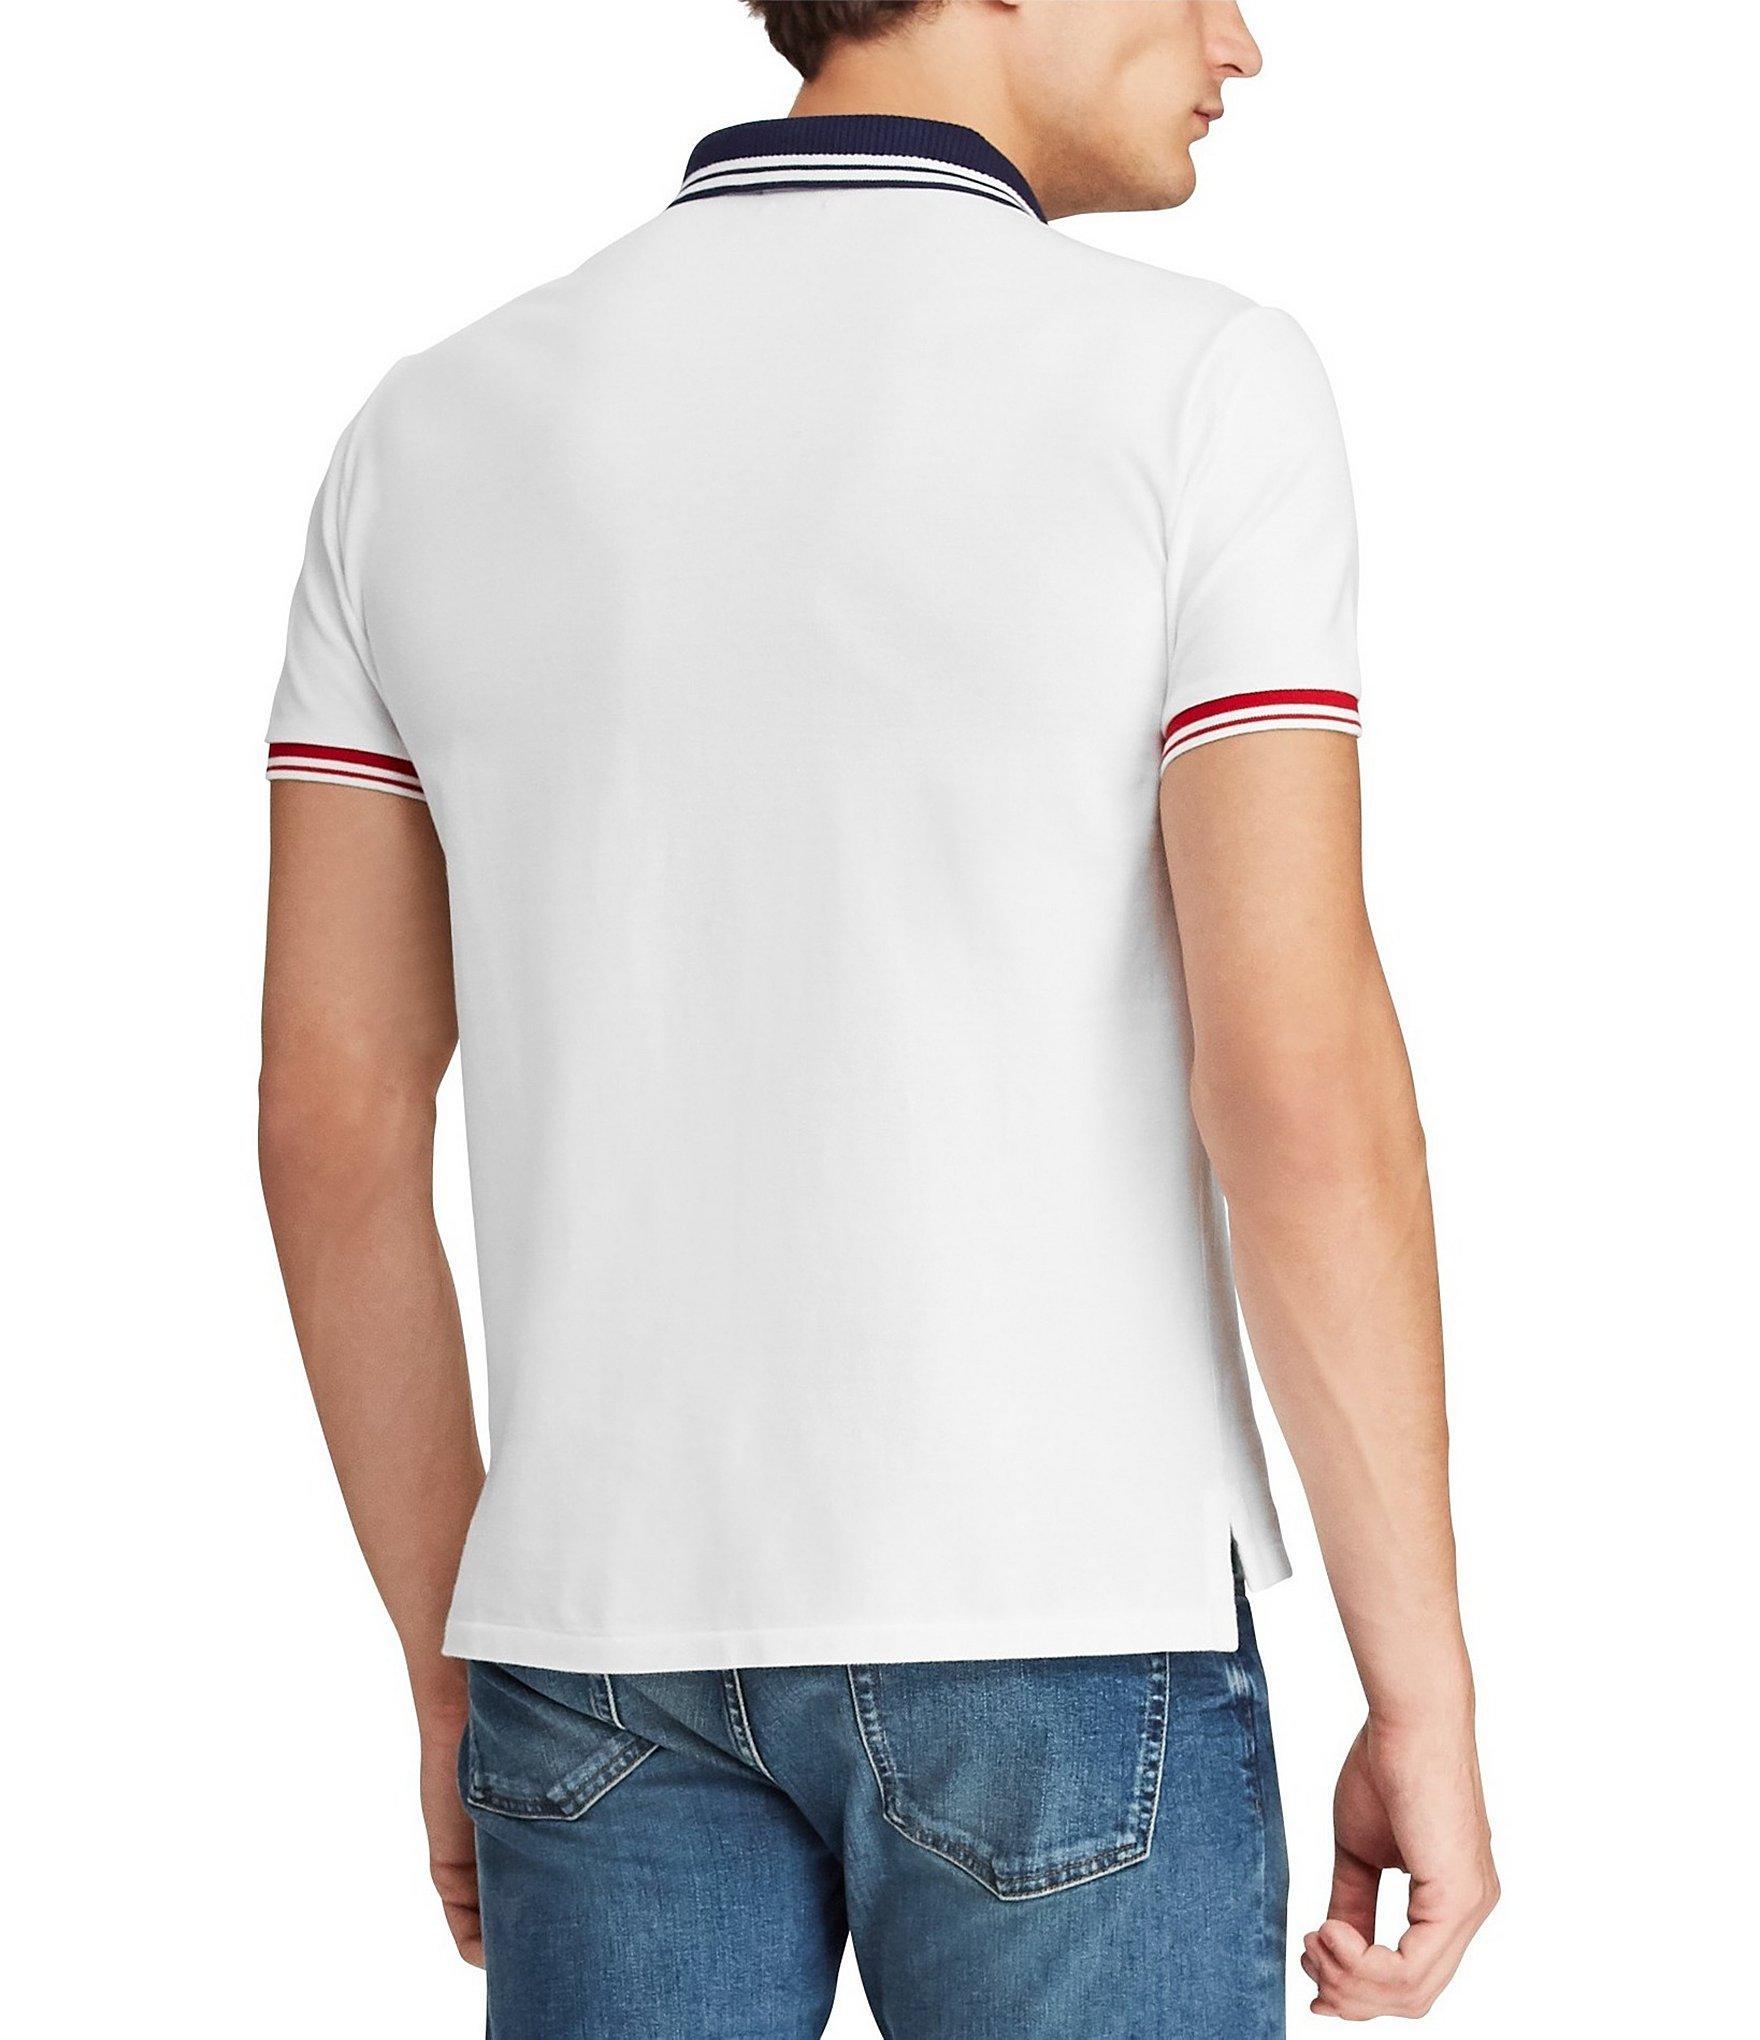 84a5ff72 Dillards Big And Tall Polo Shirts - DREAMWORKS